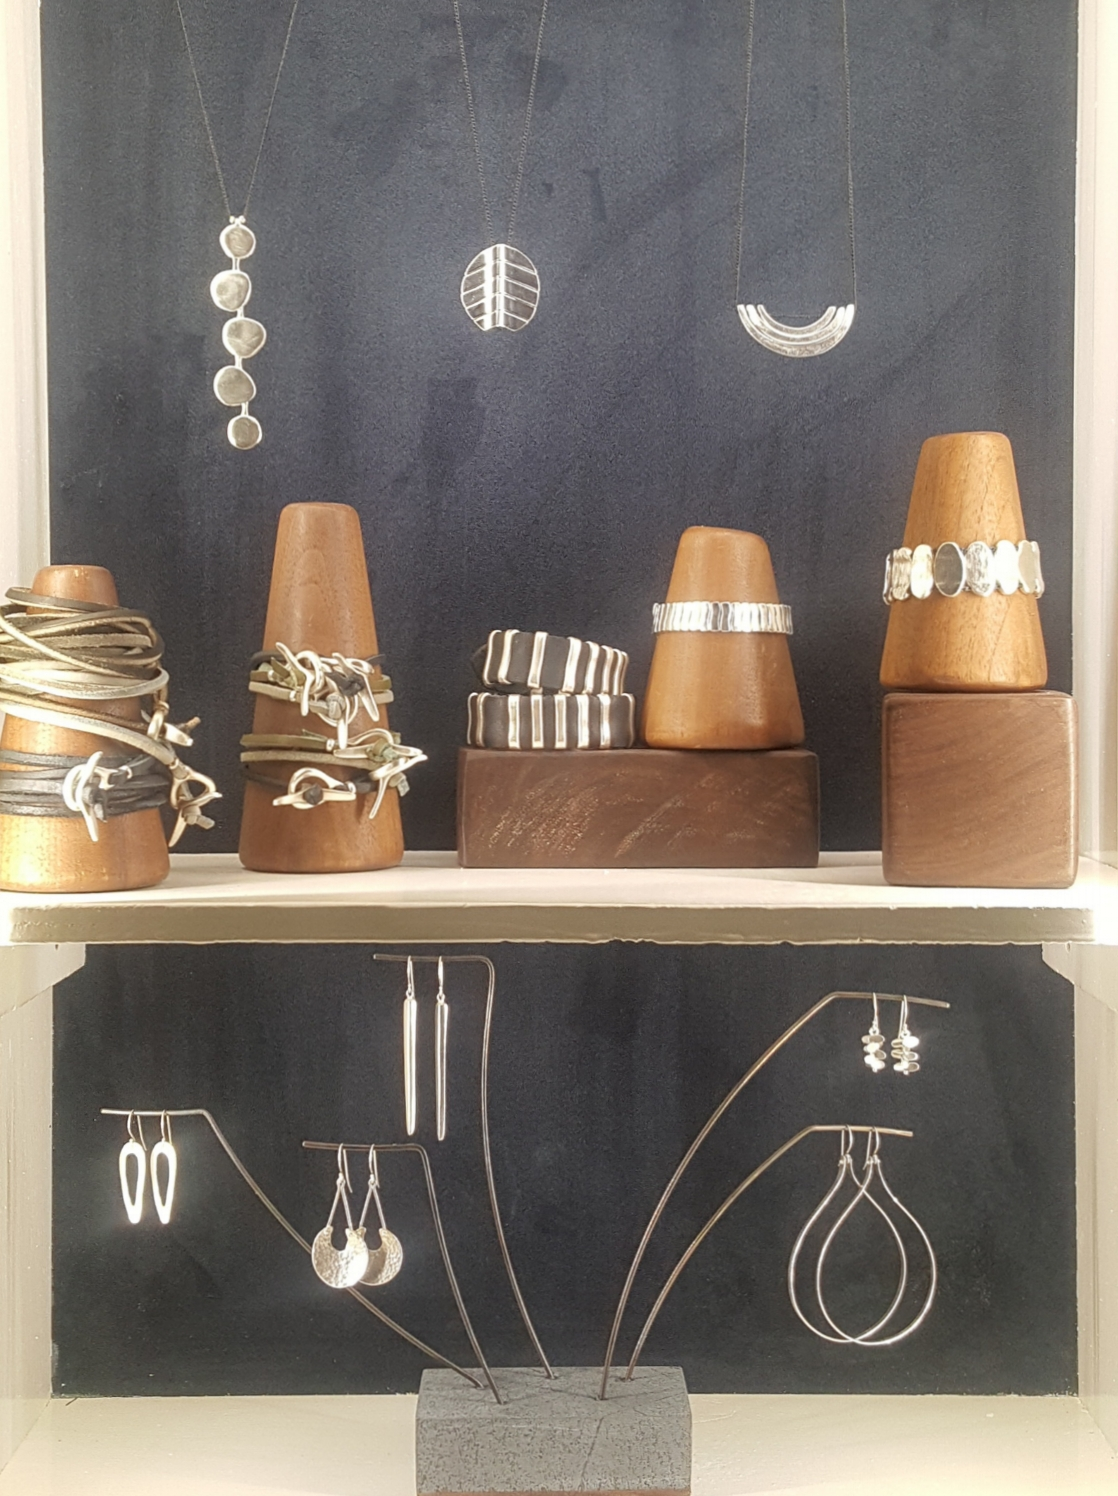 jill platner jewelry box 3 of 3 - 03.08.18.jpg